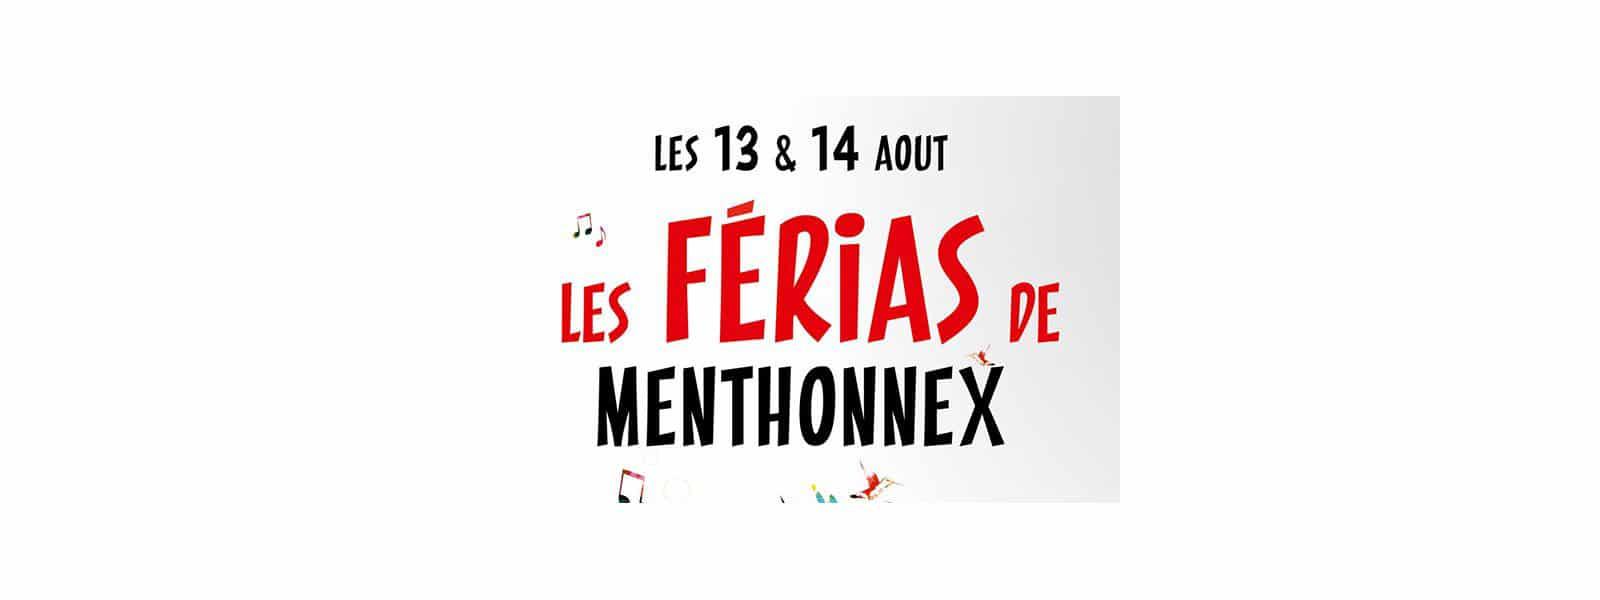 Férias de Menthonnex 2016